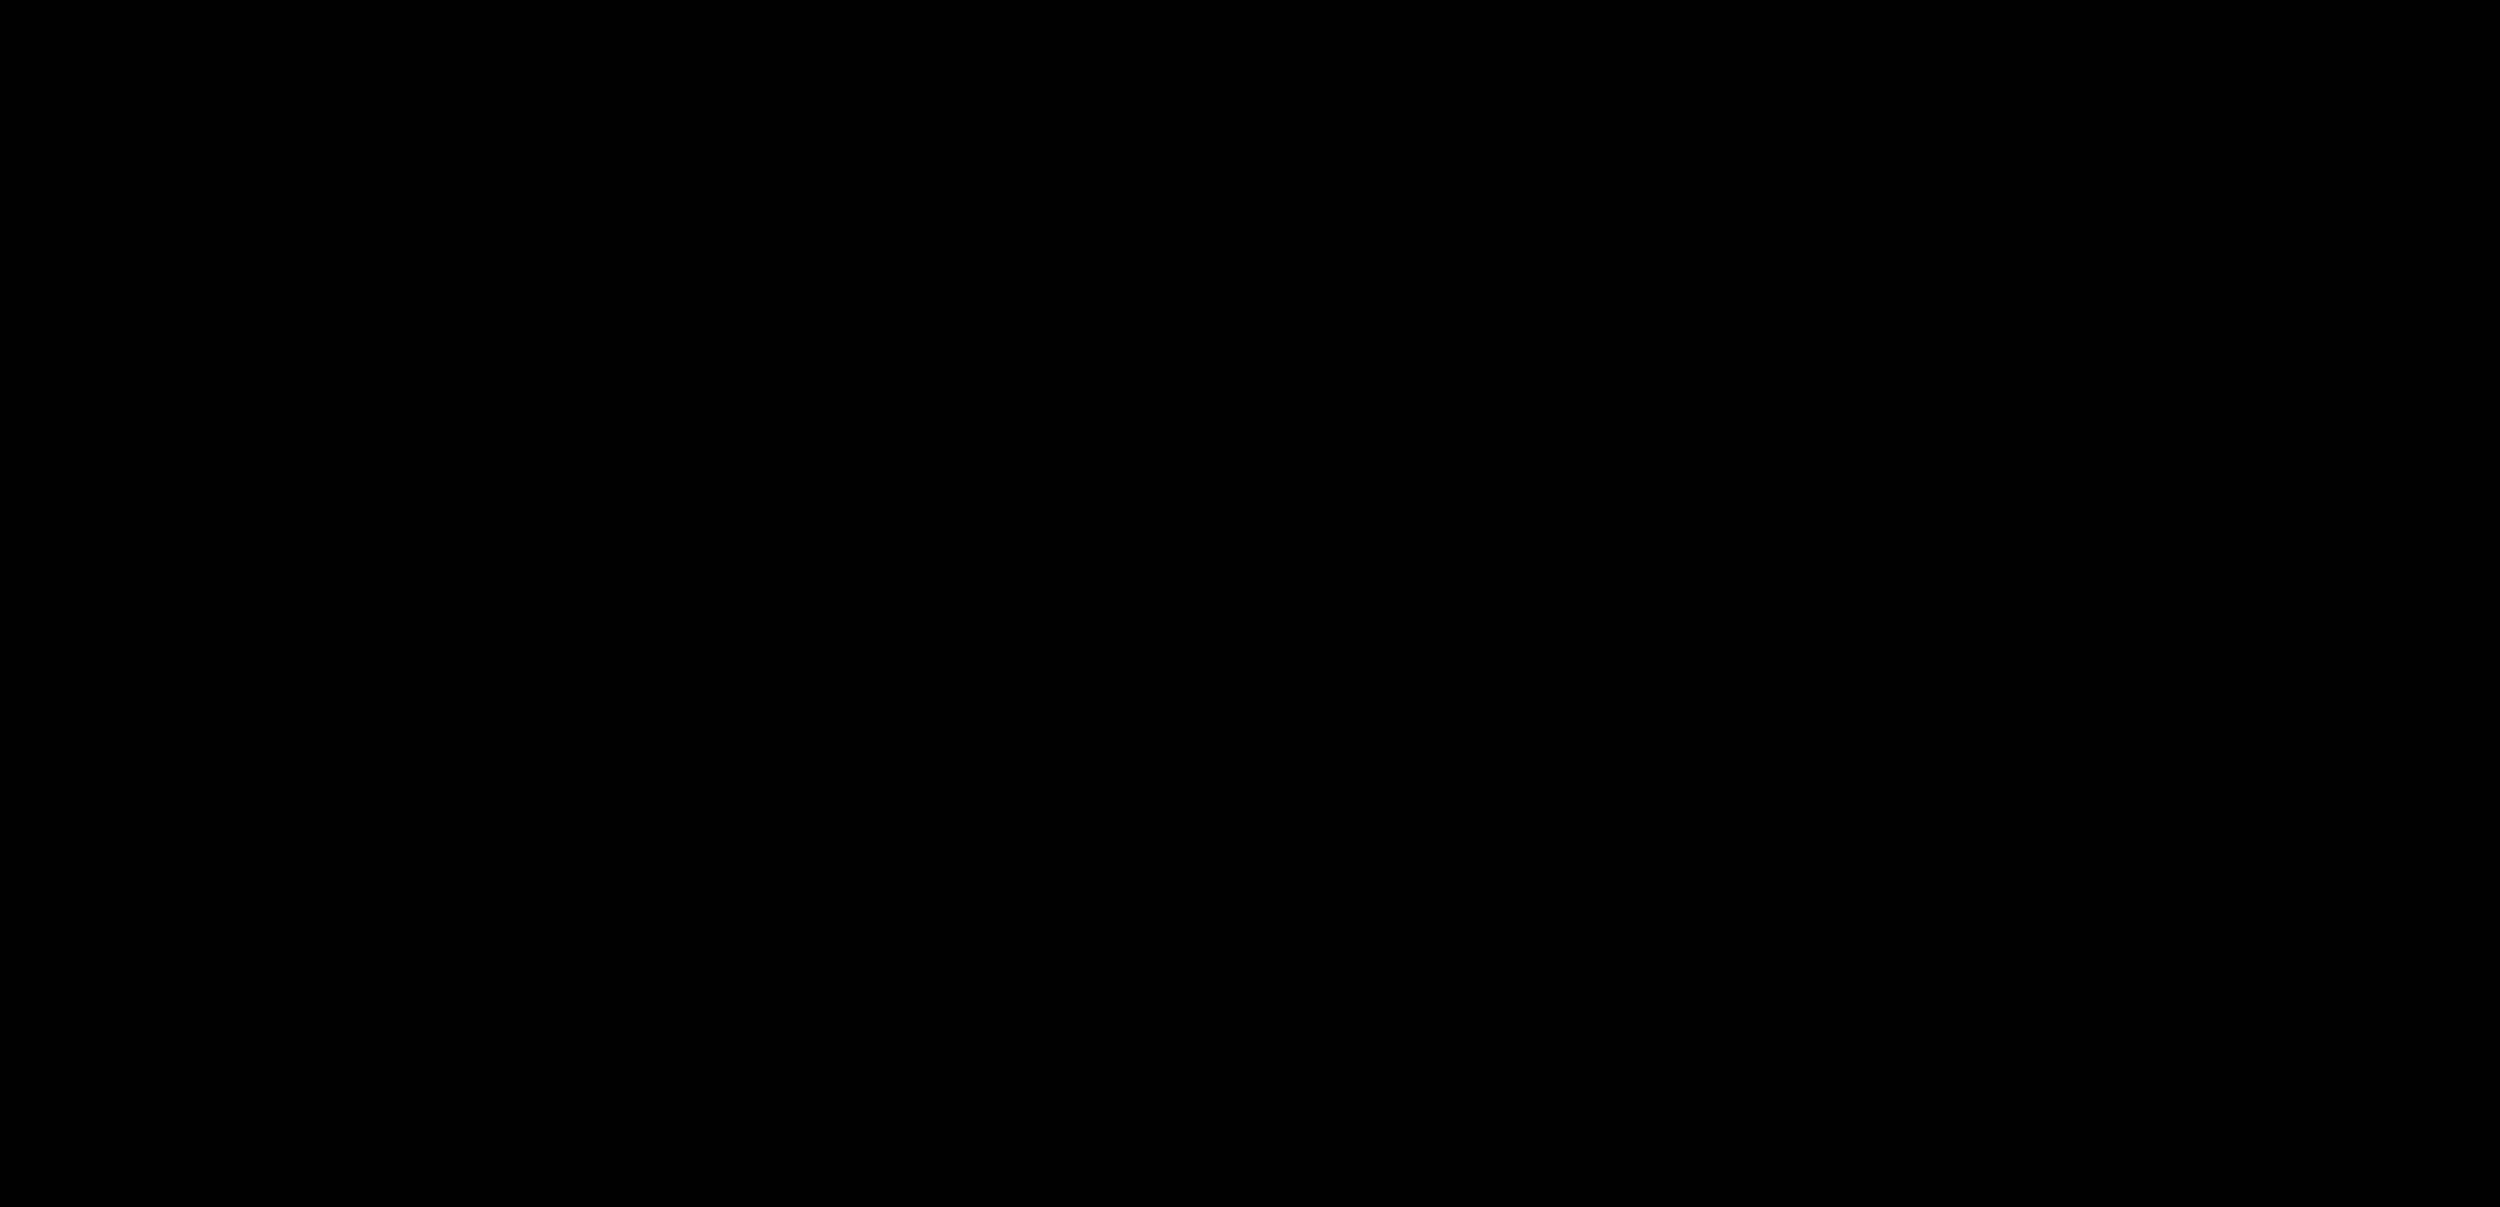 nztrio logo black.png